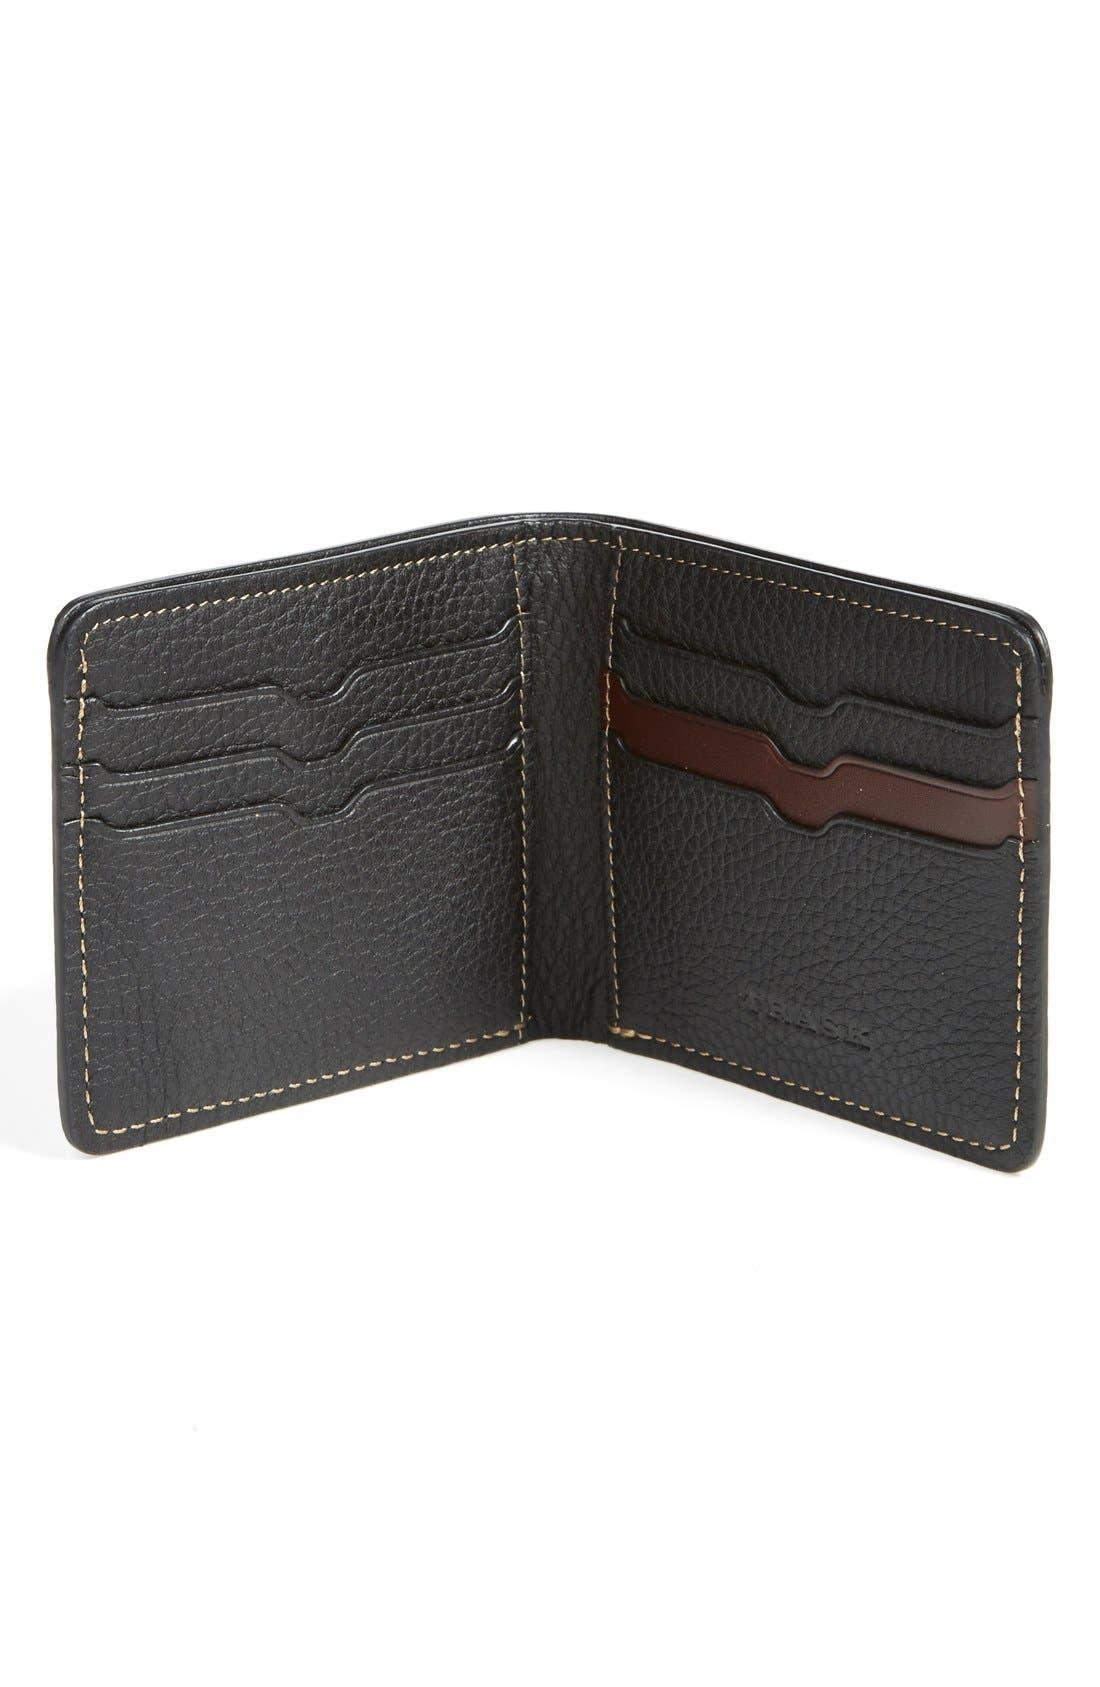 'Jackson' Bison Leather Wallet,                             Alternate thumbnail 5, color,